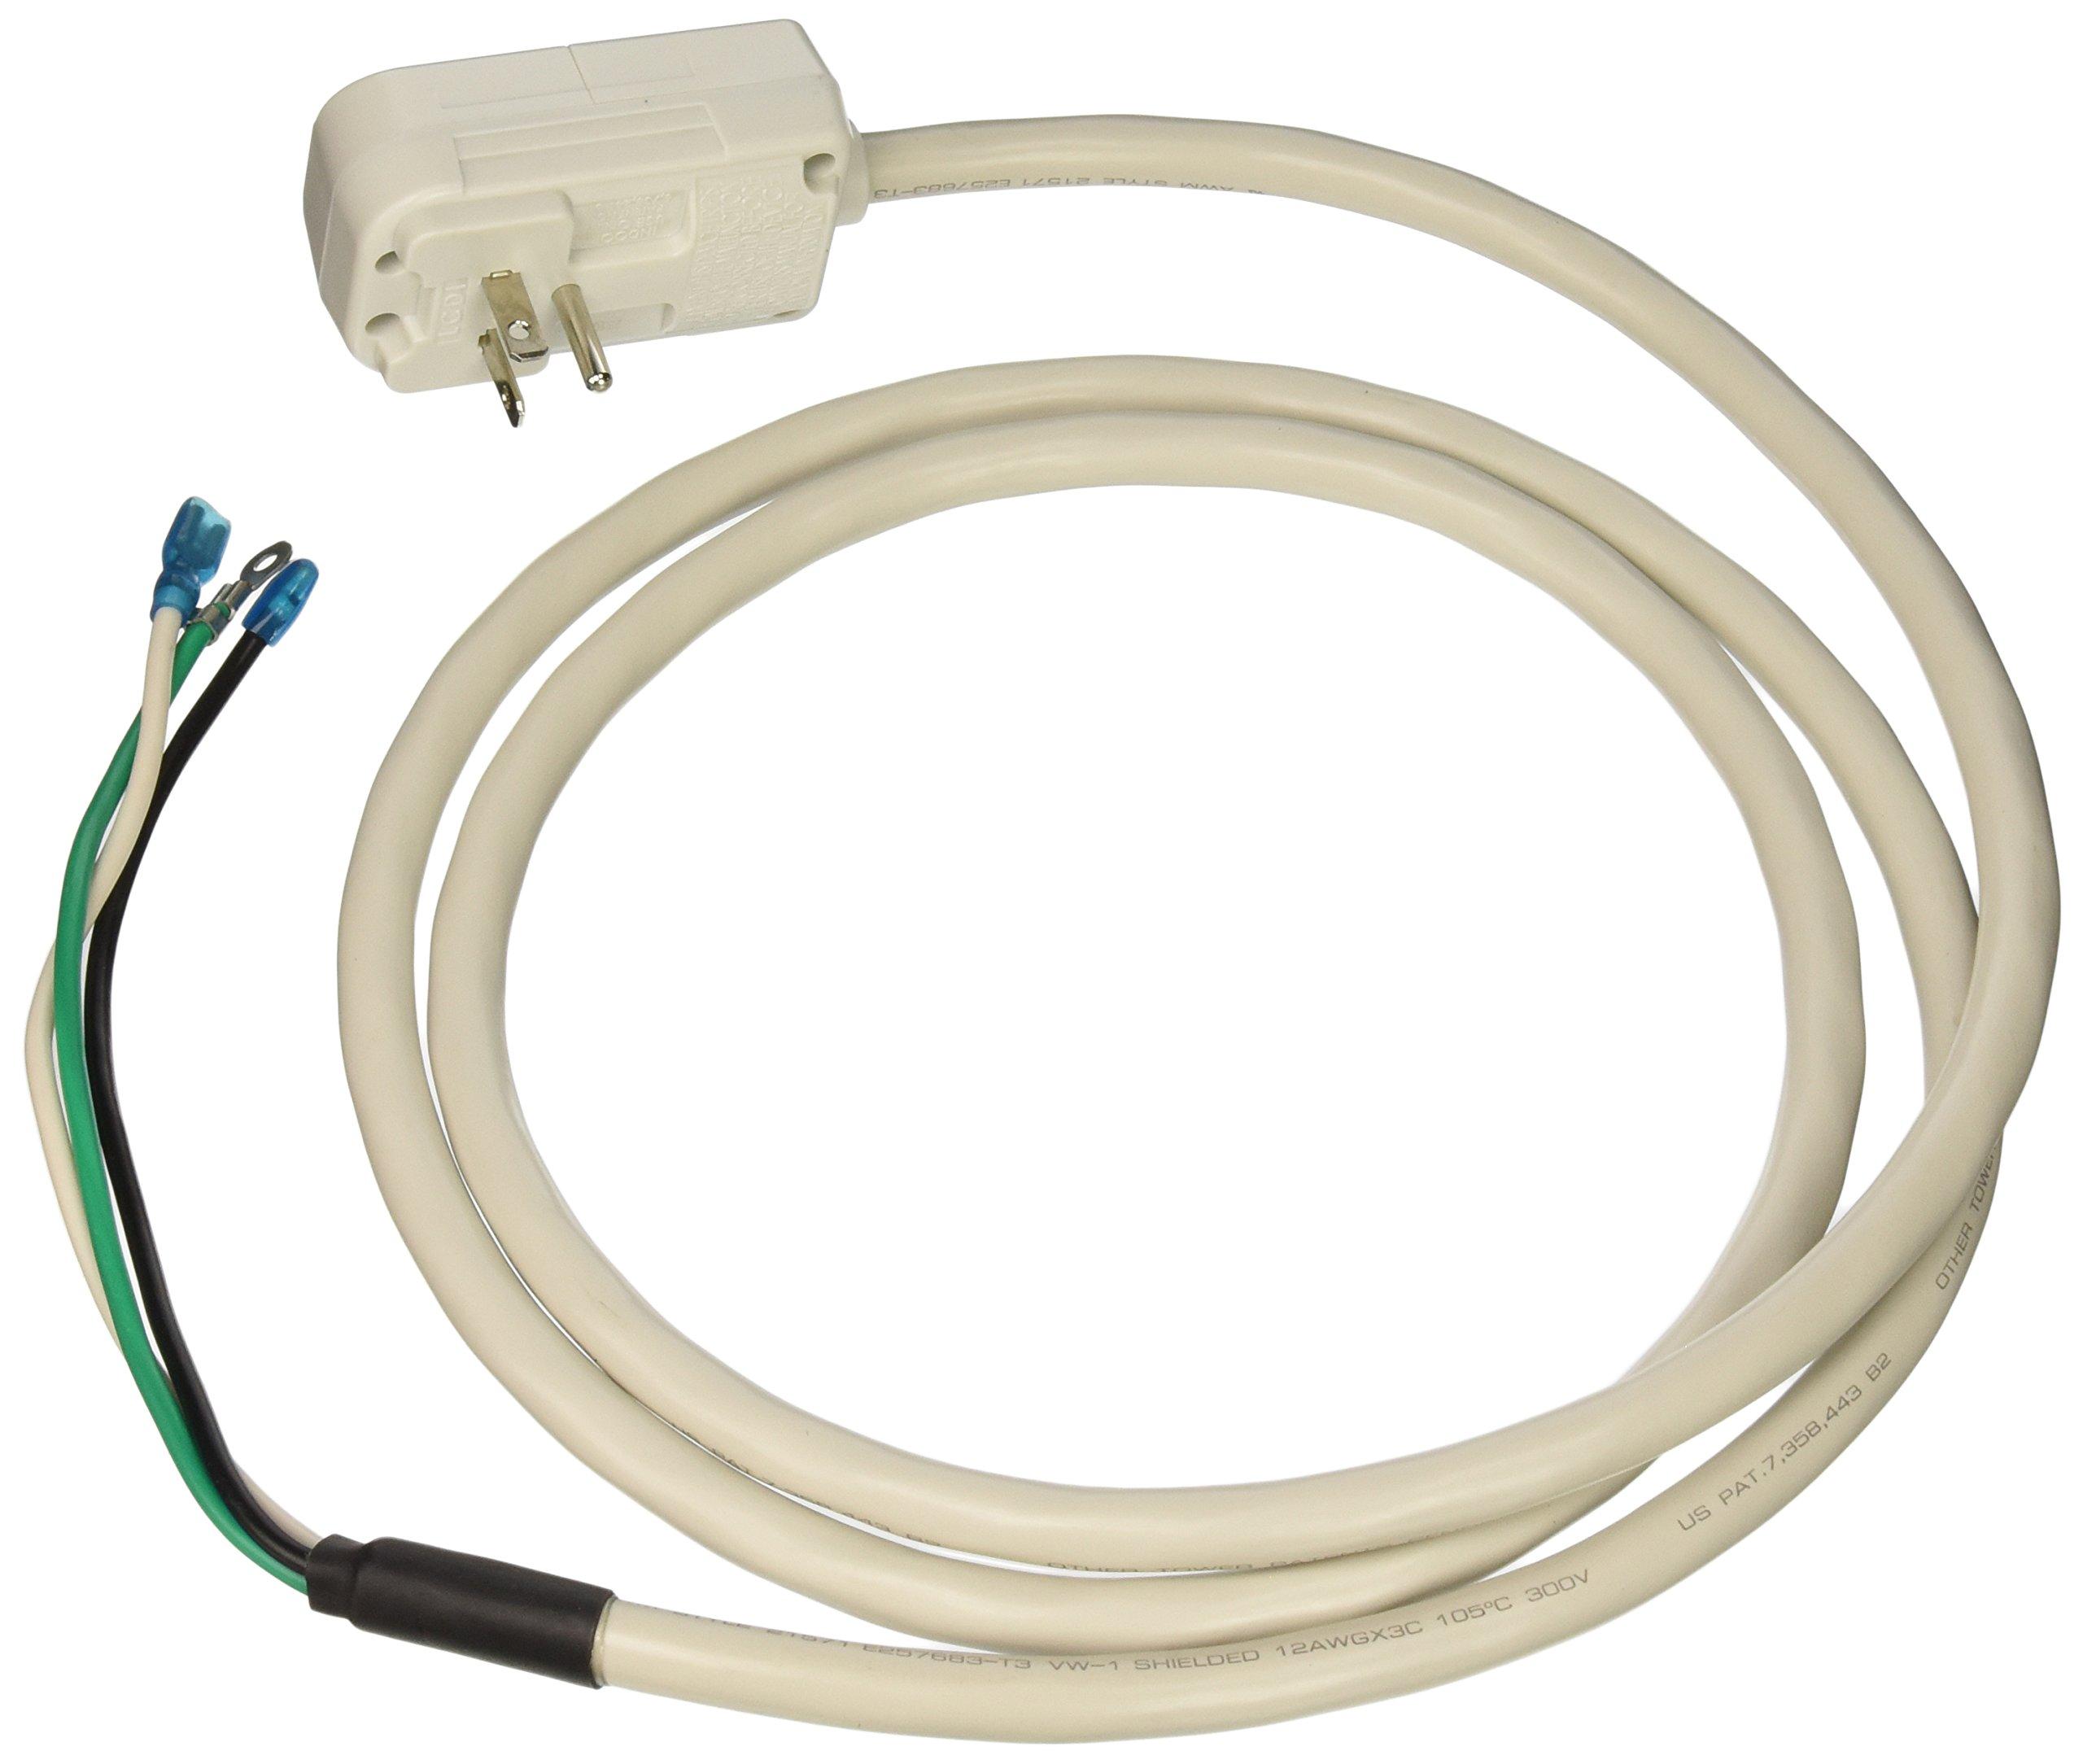 Frigidaire 5304471066 Air Conditioner Power Cord